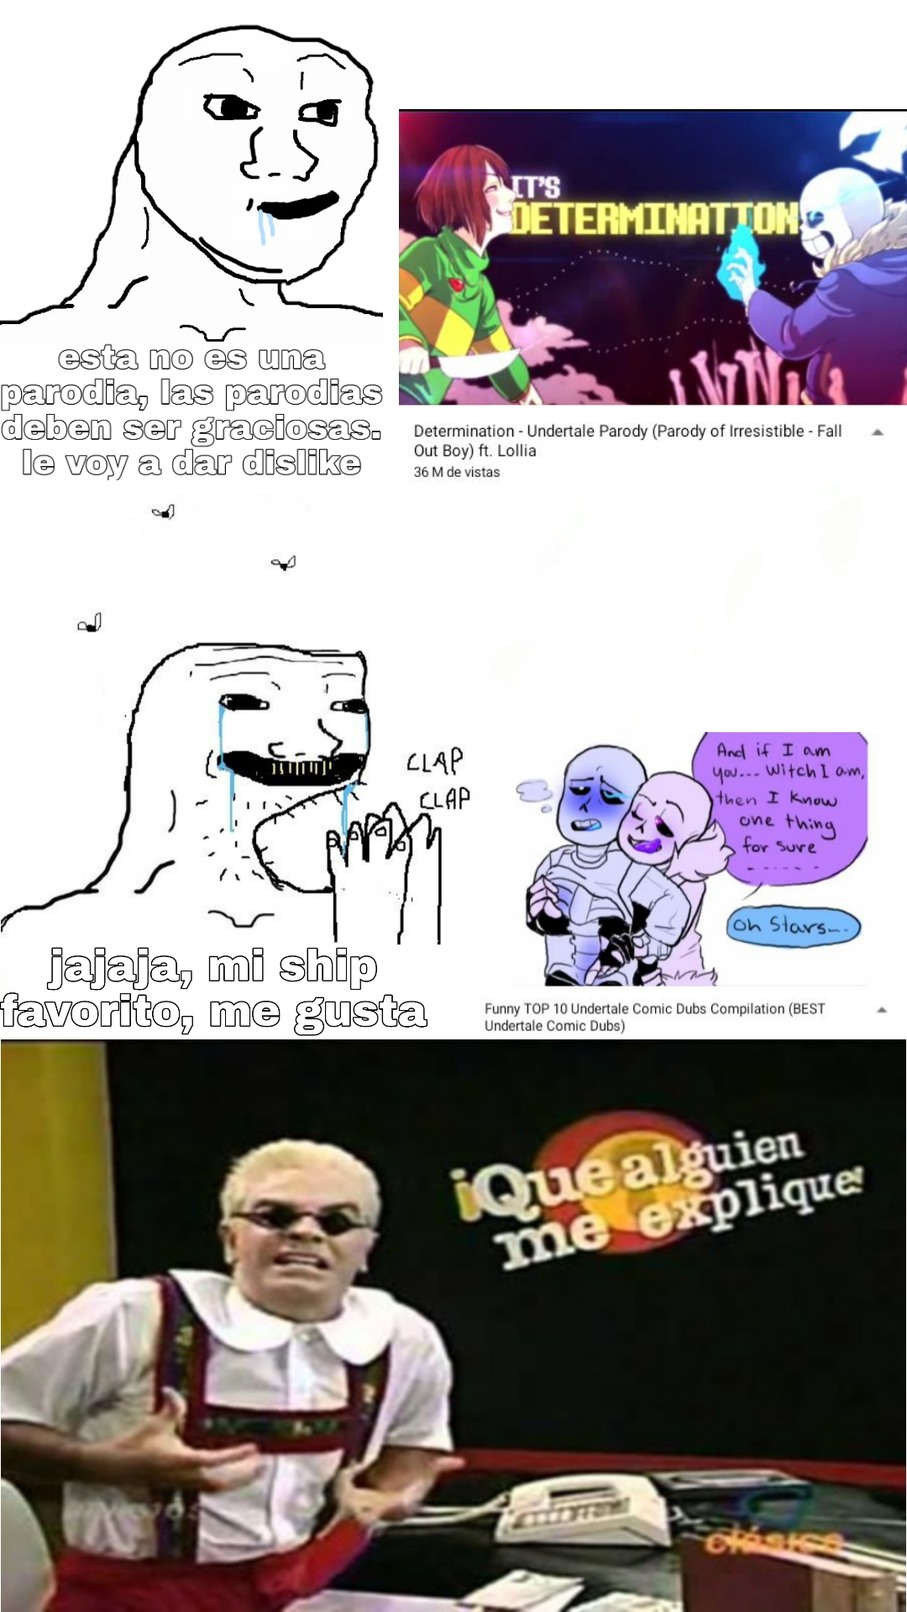 Equisden't - meme